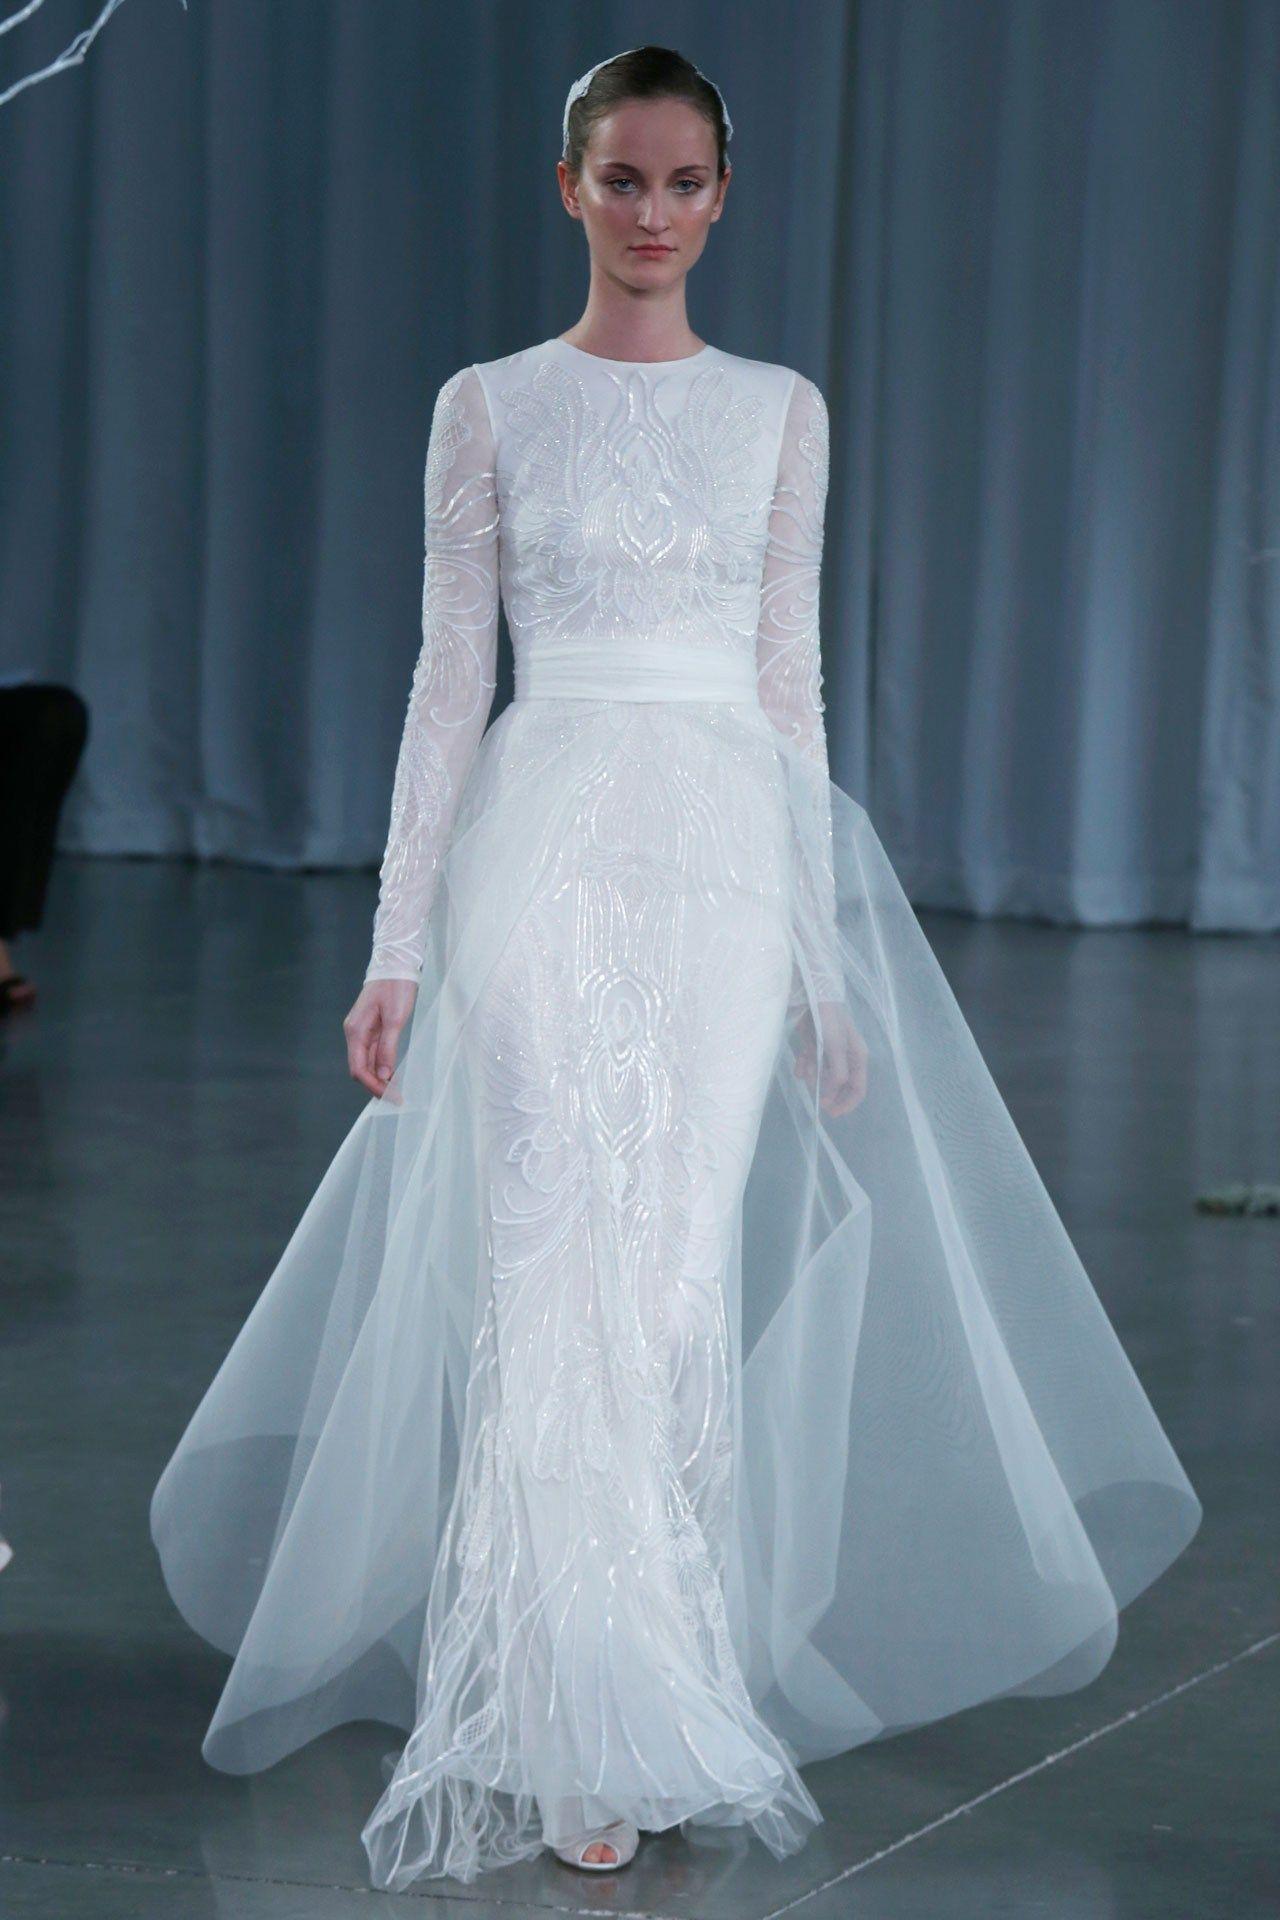 Wedding Dresses - The Ultimate Gallery (BridesMagazine.co.uk ...